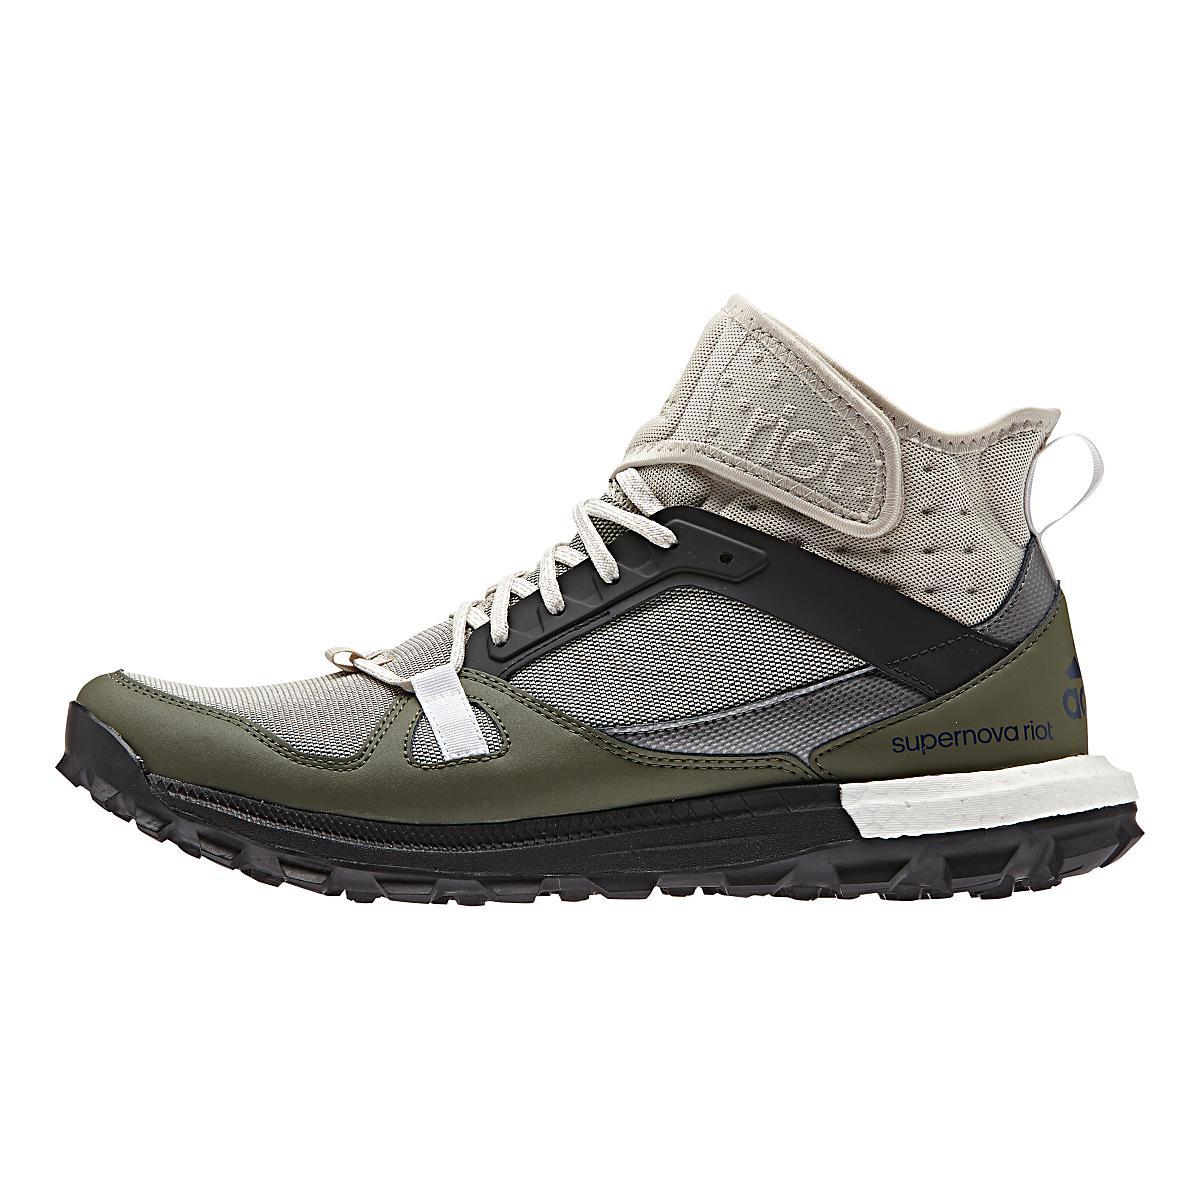 a380724837188 Mens adidas Supernova Riot Trail Running Shoe at Road Runner Sports